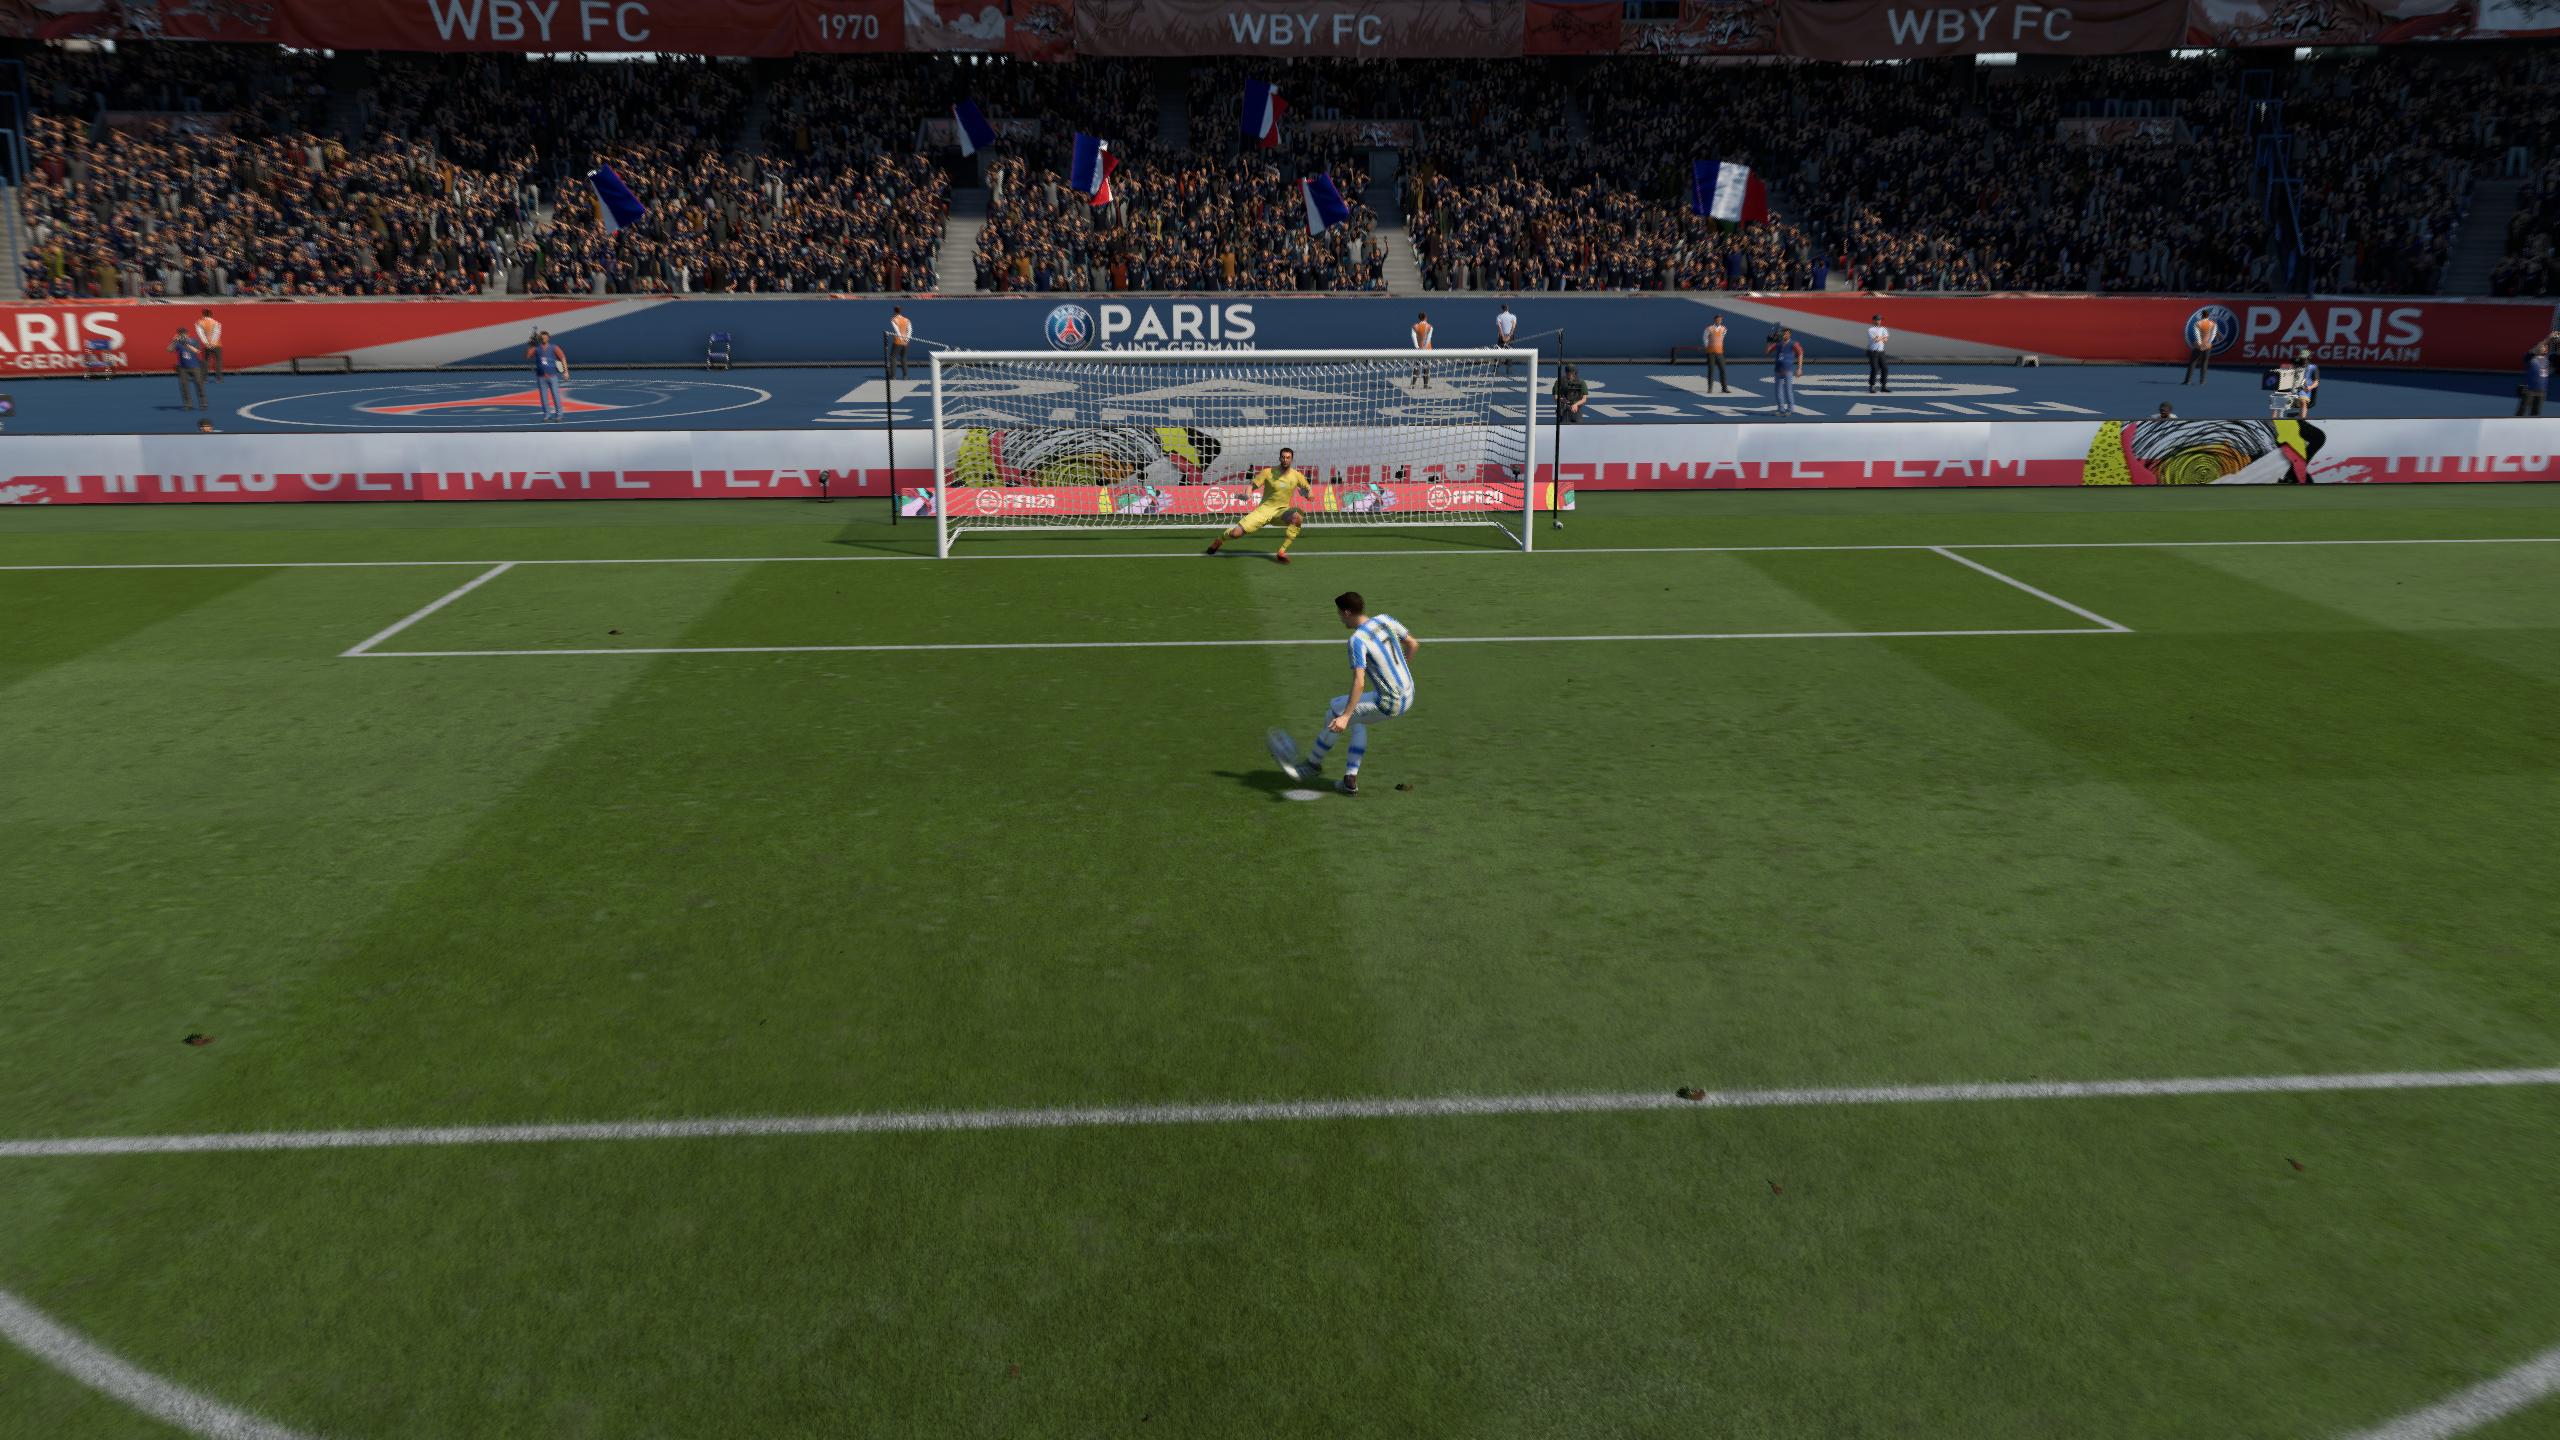 FIFA 20 Screenshot 2019.12.24 - 14.33.01.99